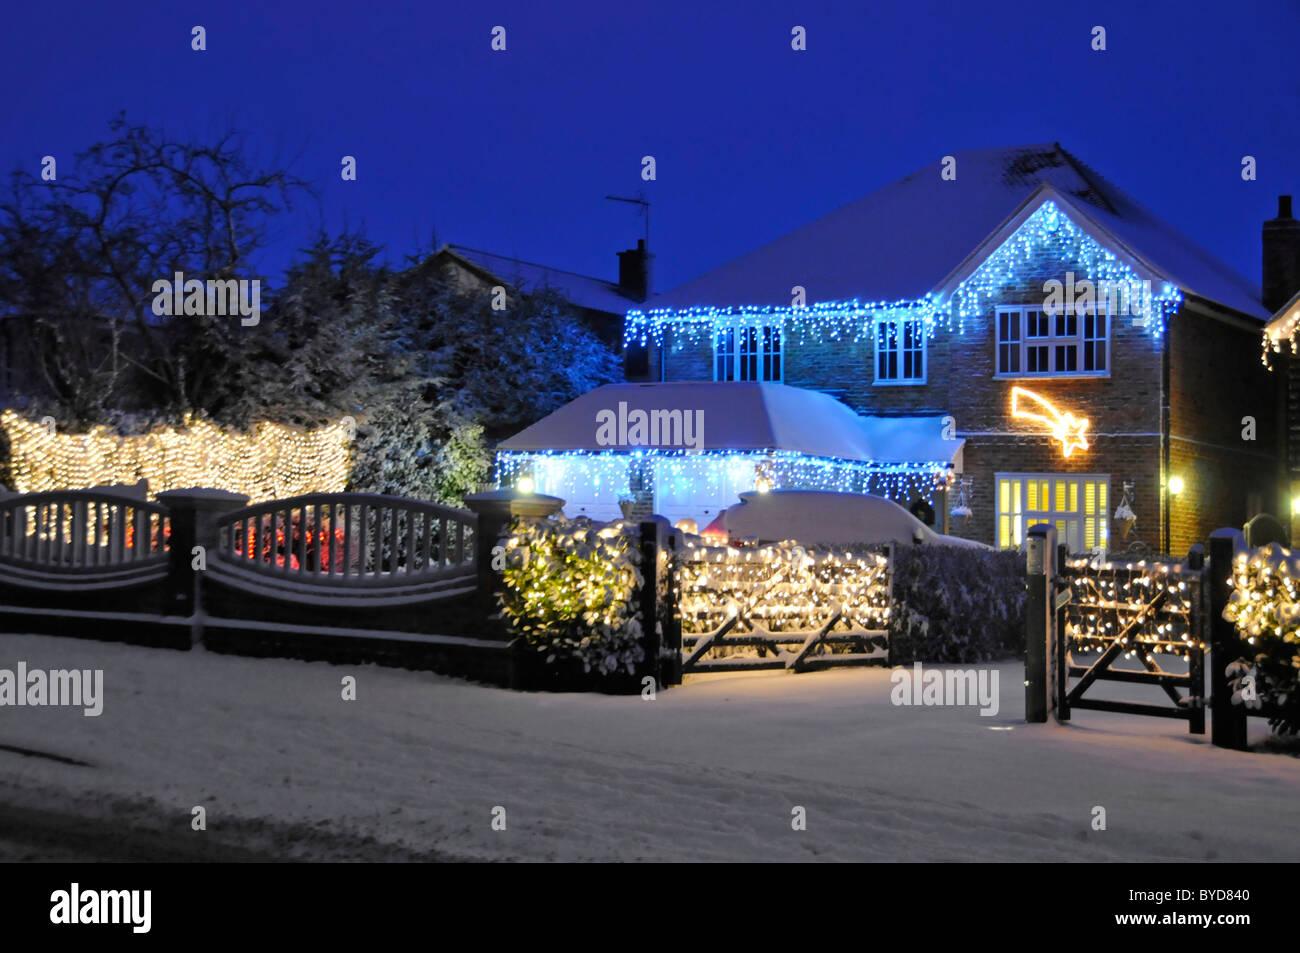 Snow house with Christmas lights - Stock Image